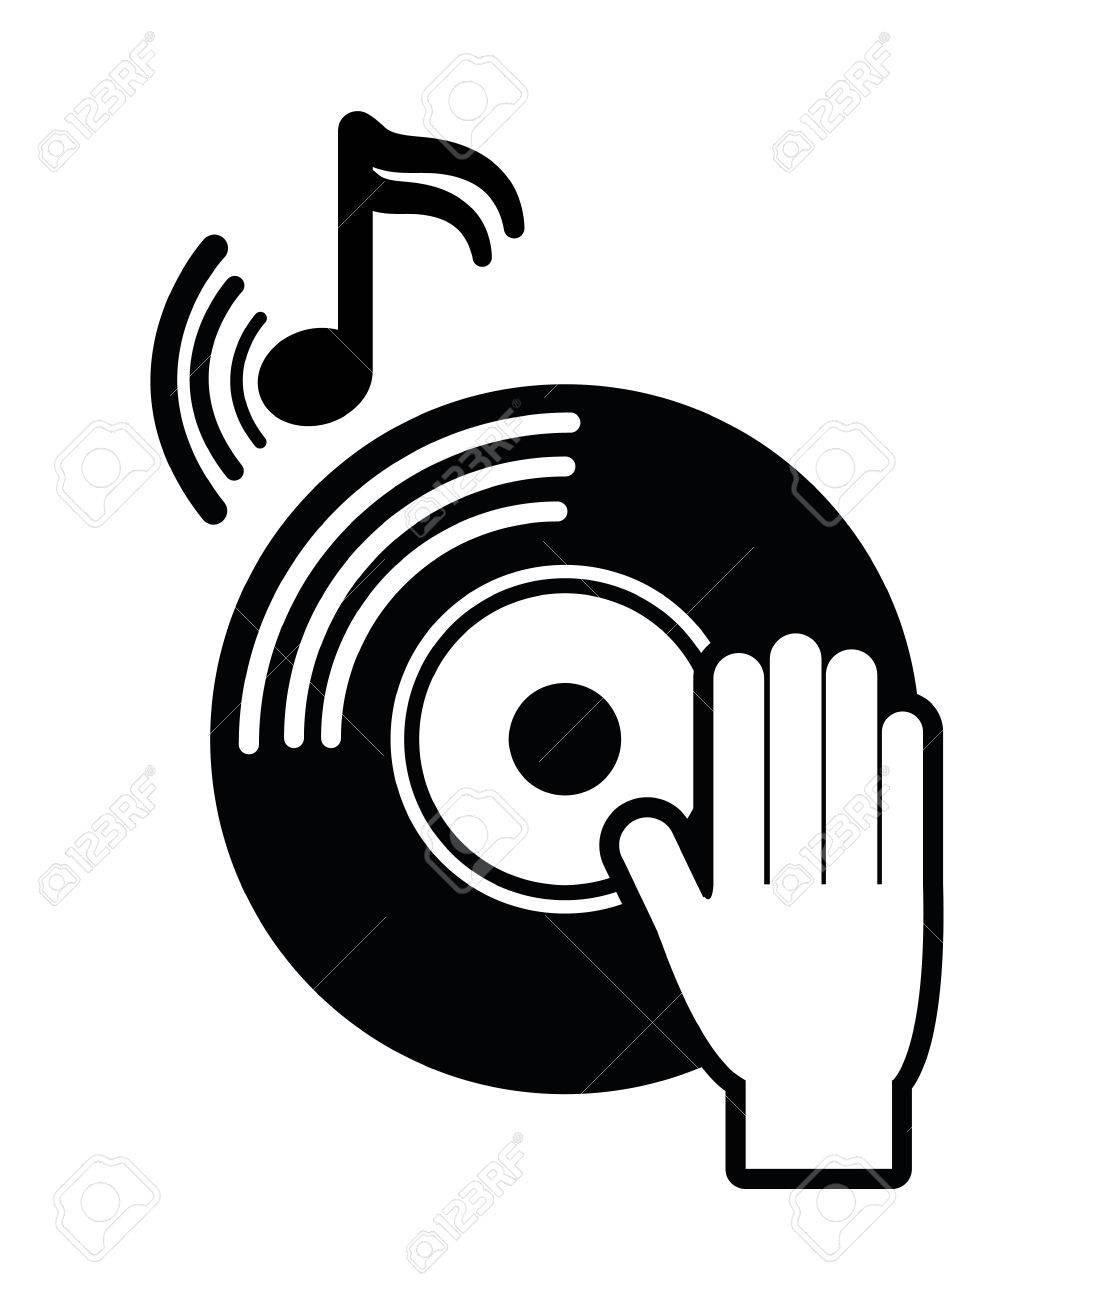 dj electronic music party graphic design vector illustration rh 123rf com dj victoria dj victor